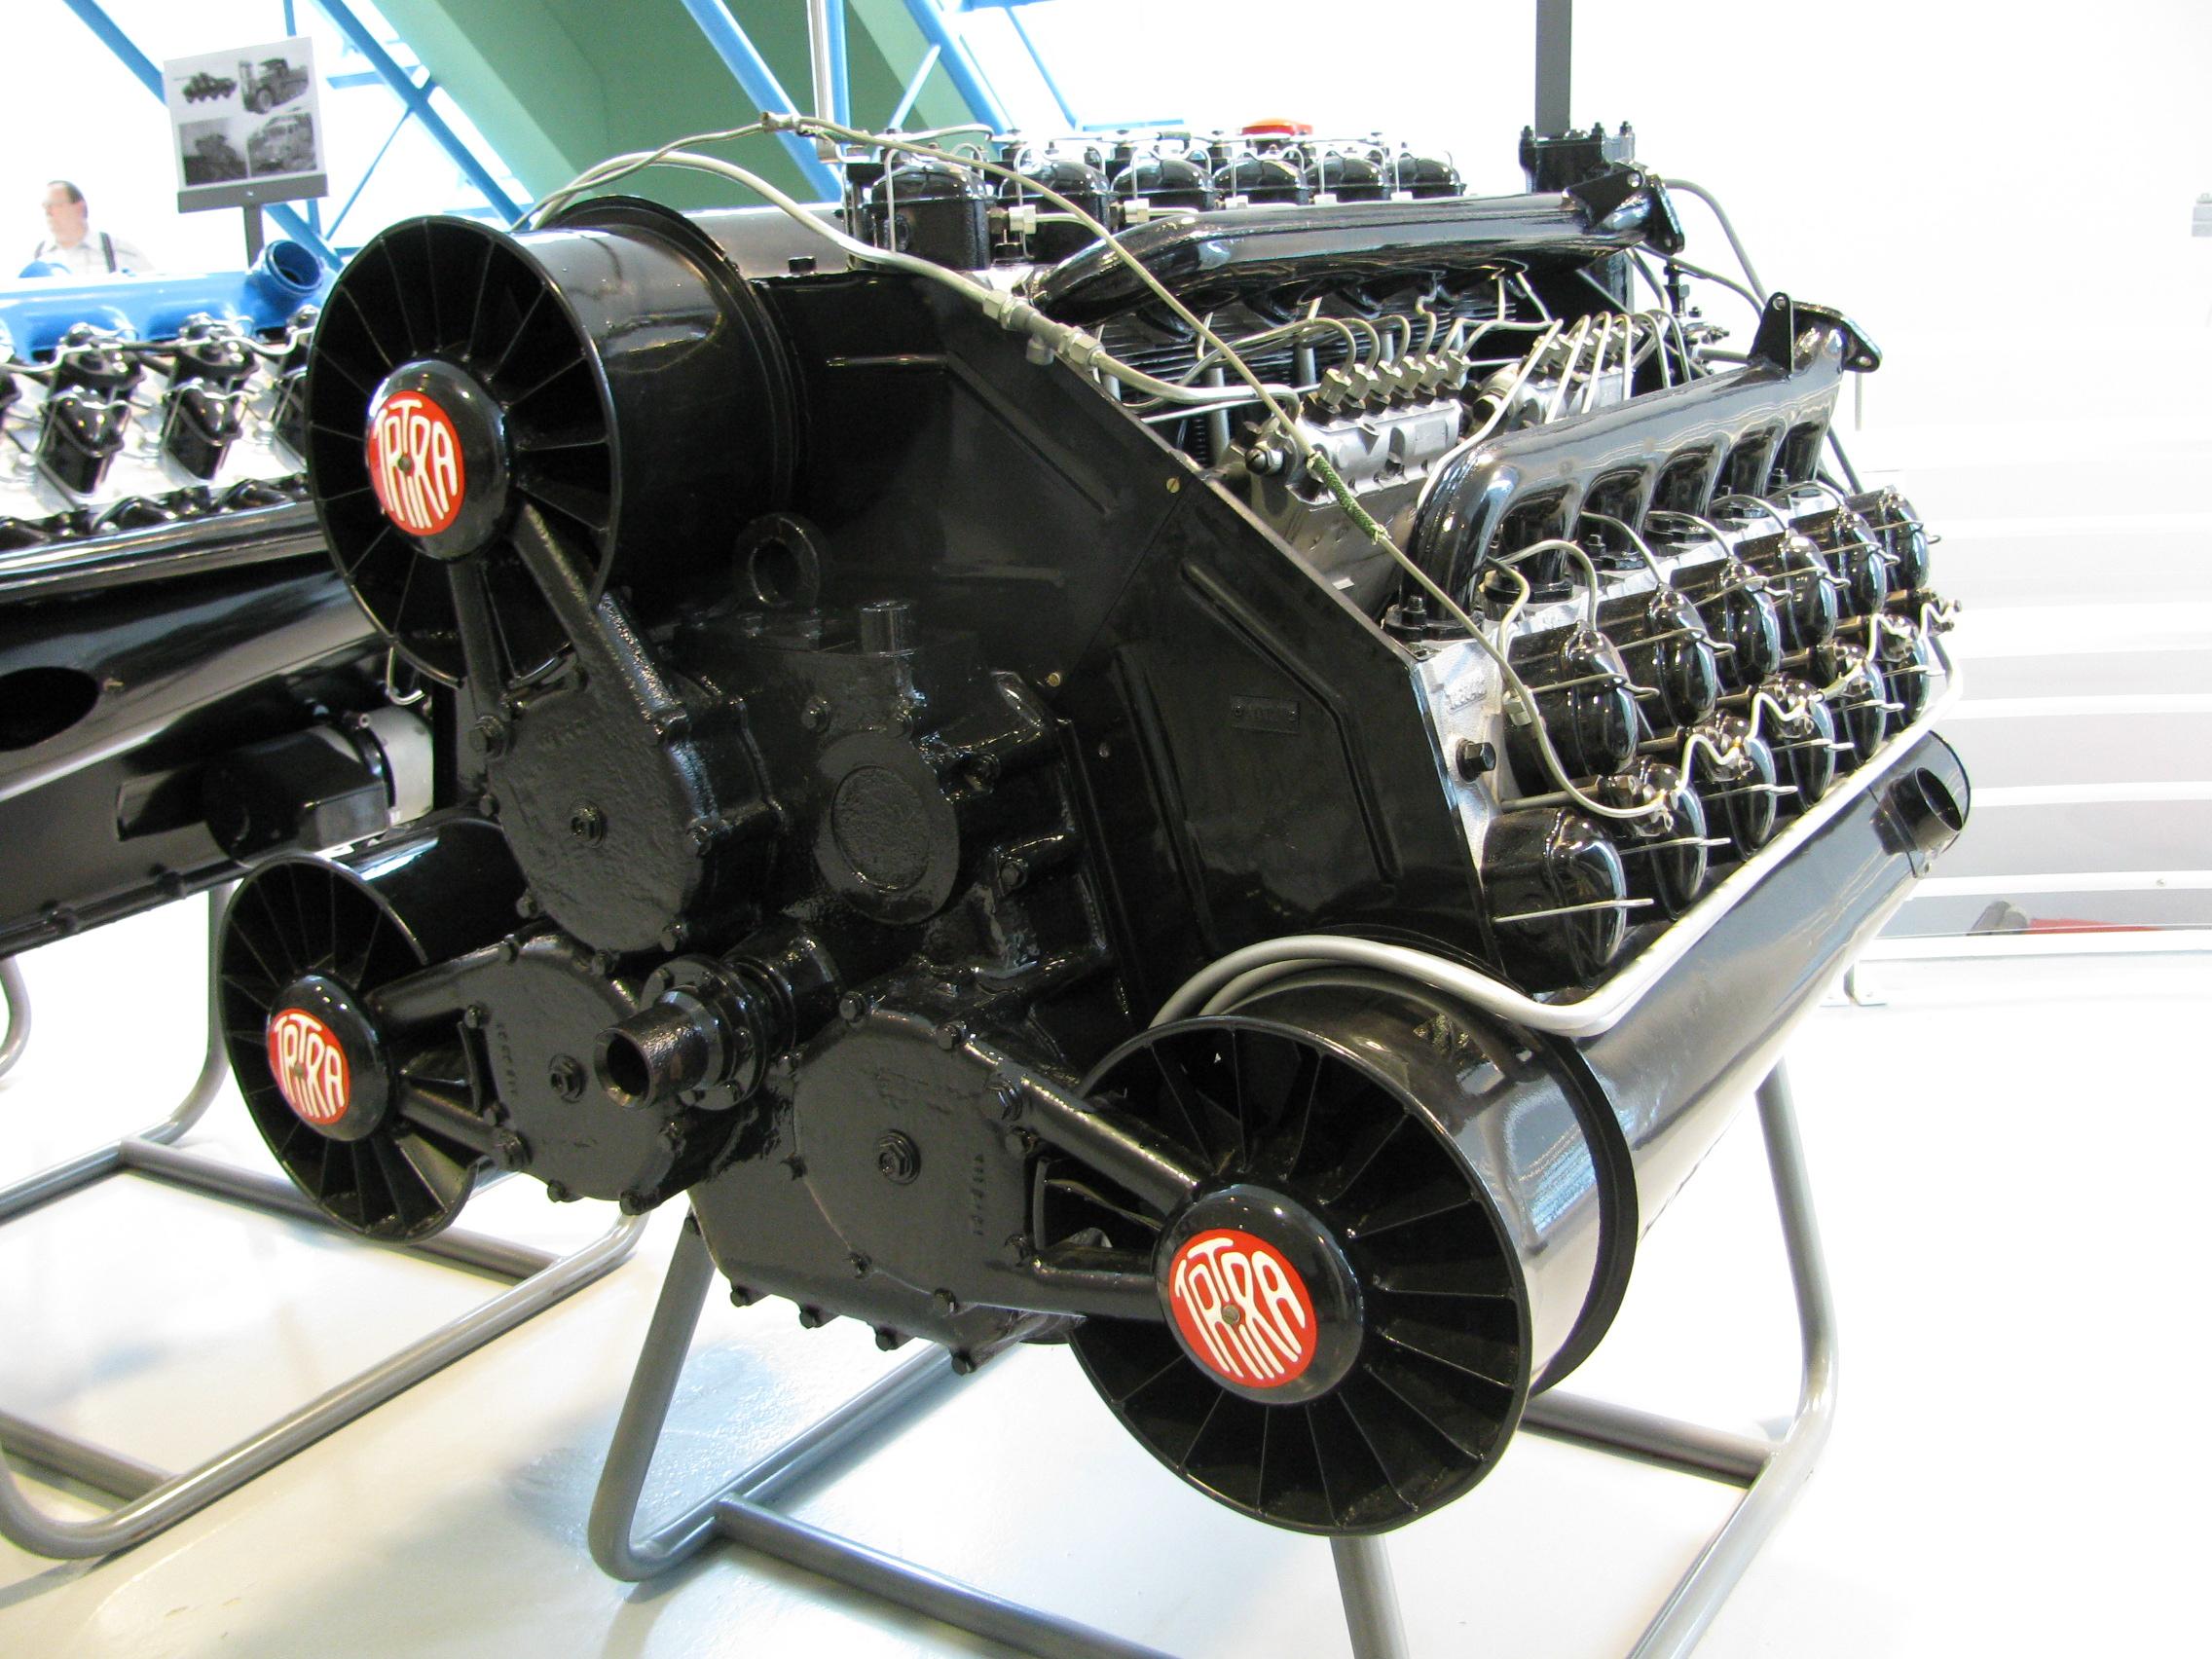 a tribute to awesome engines pop culture gallery ebaum s world rh ebaumsworld com Lamborghini V12 Engine Lamborghini V12 Engine